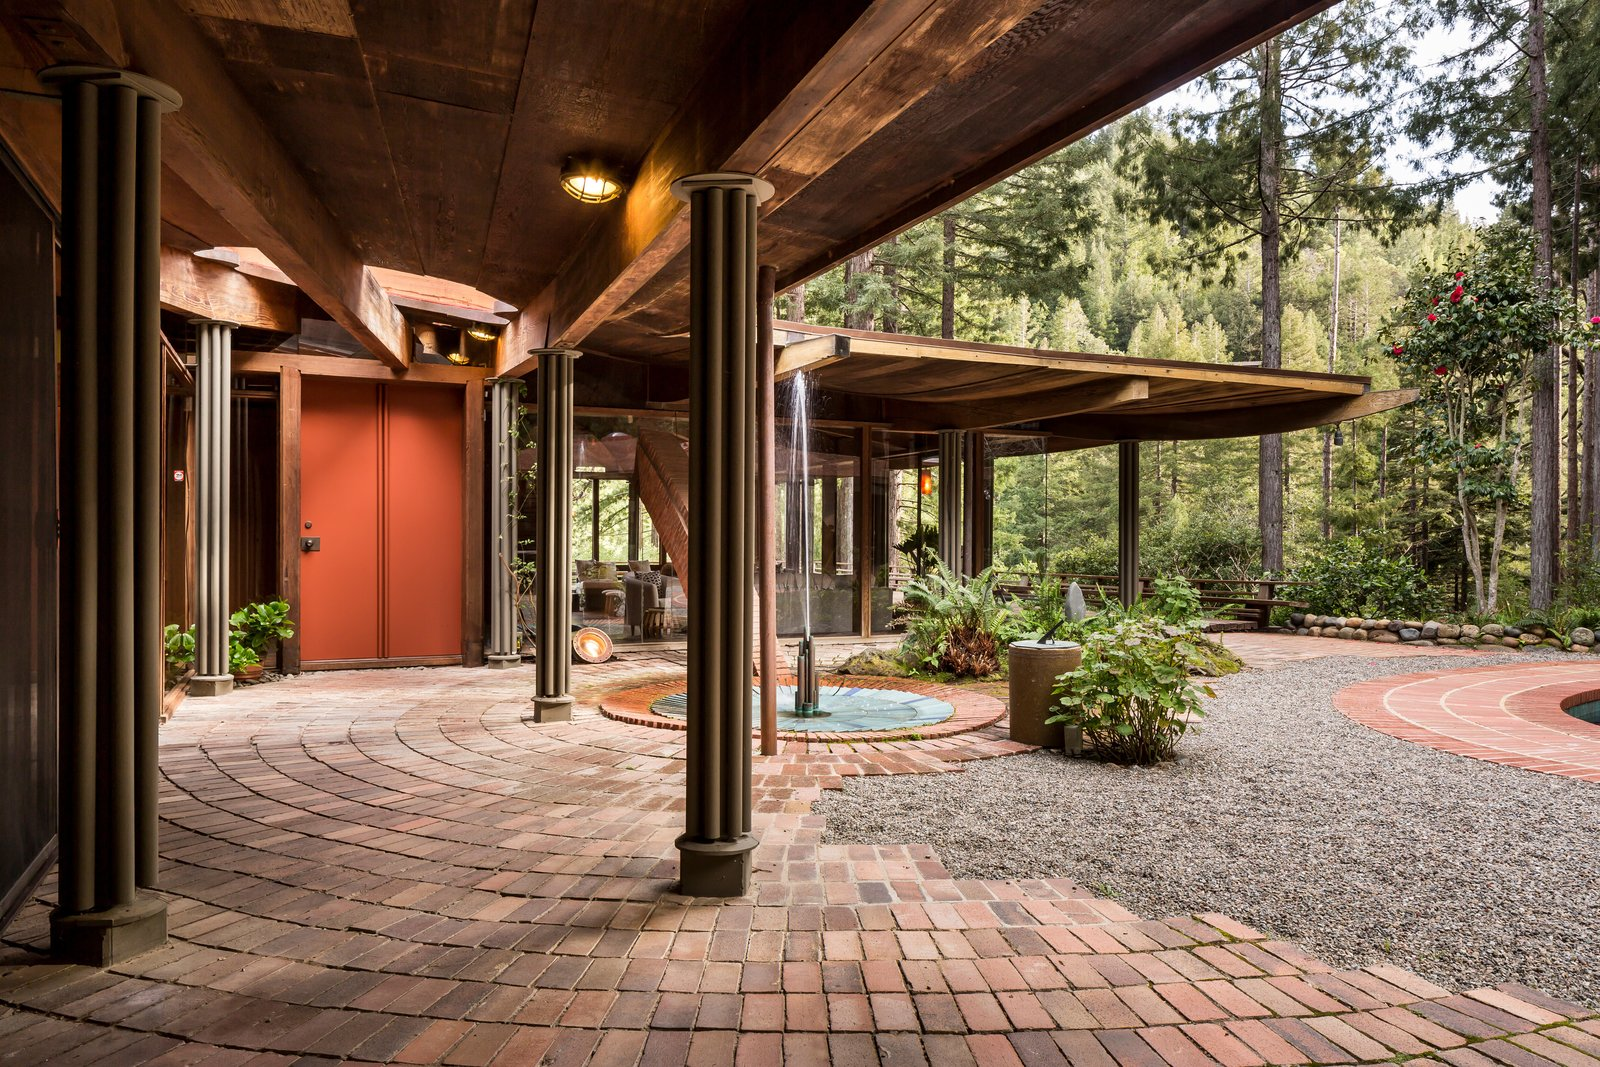 861 Lovell Avenue by Daniel Liebermann- Mid Century House for Sale